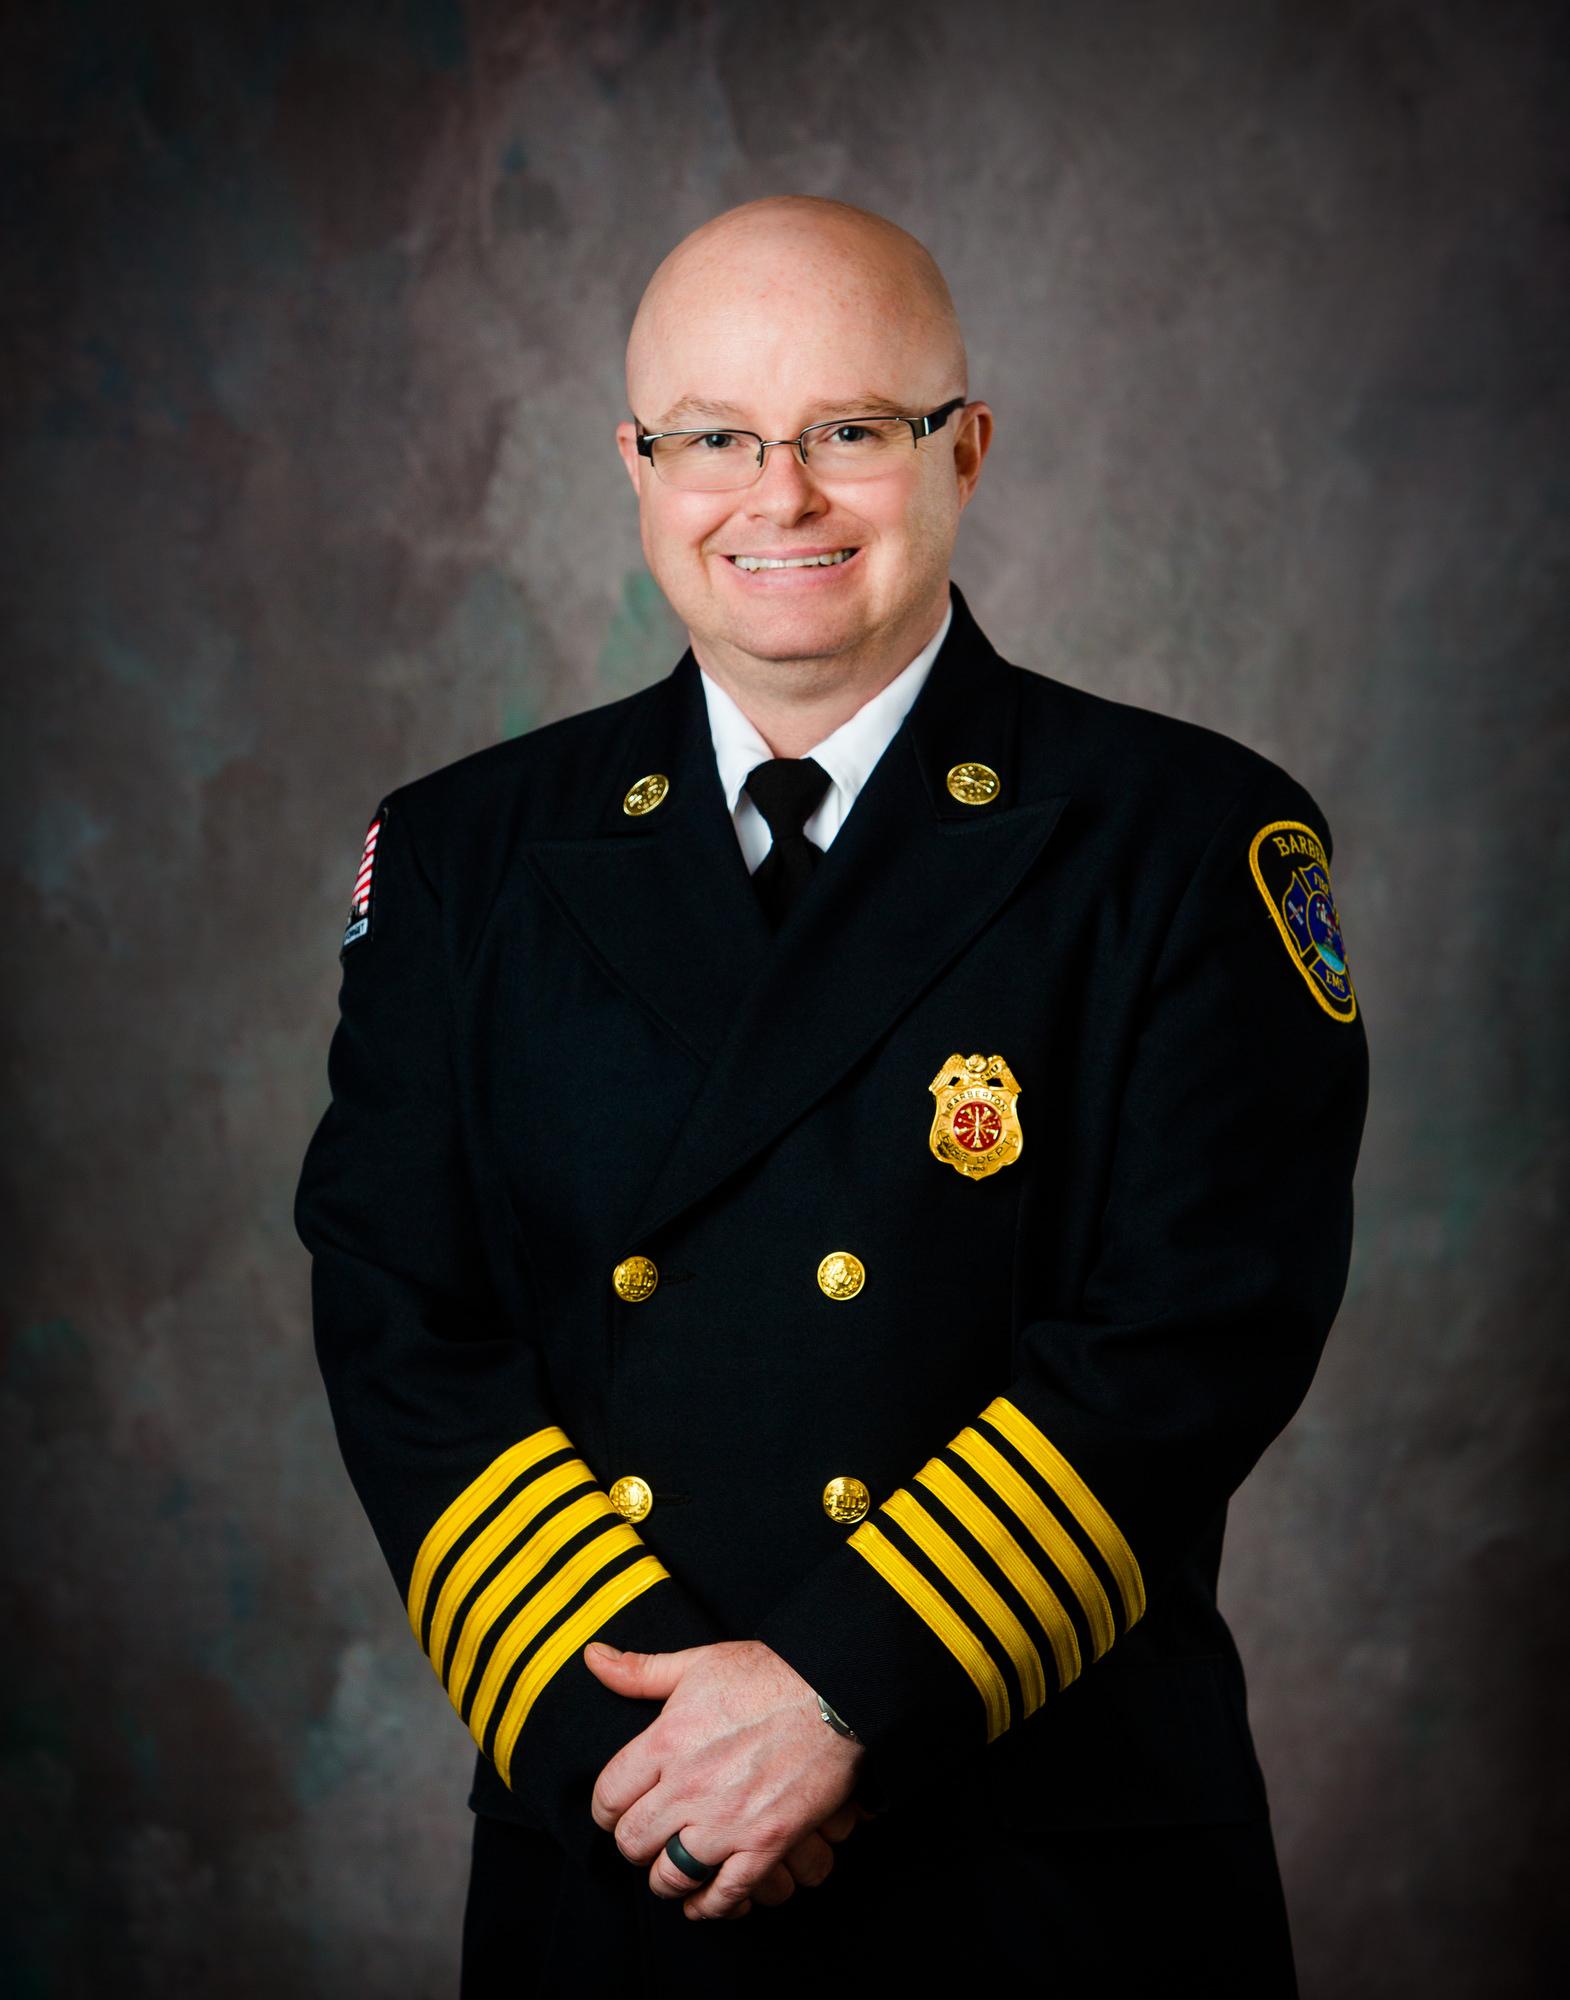 A photo of Fire Chief Robert Pursley in uniform